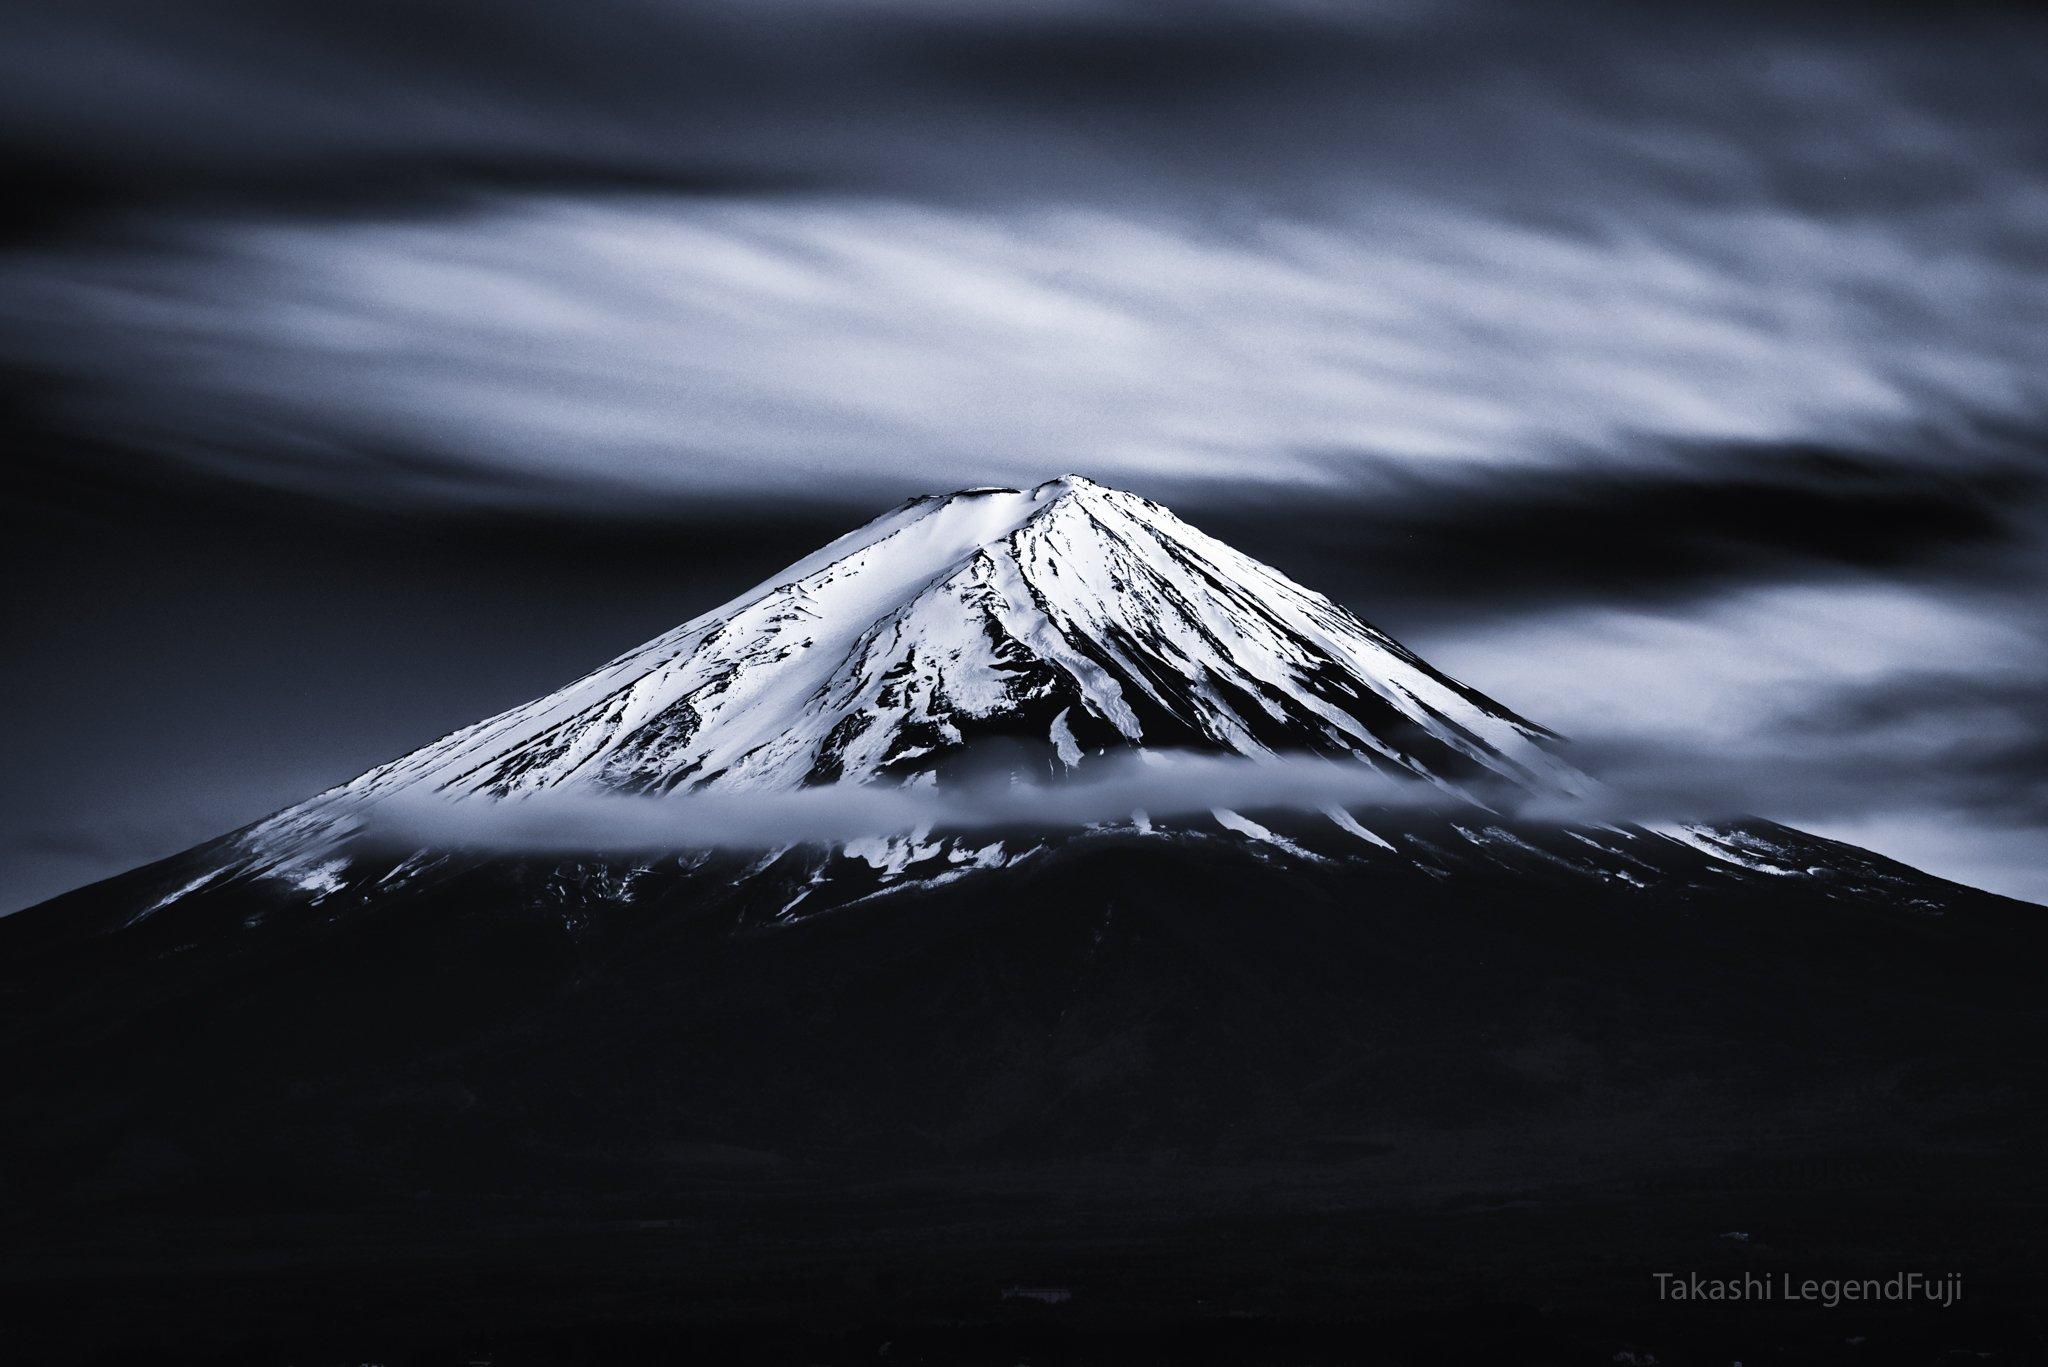 Fuji,mountain,Japan,clouds,snow,peak,summit,white,blue,sky,amazing,beautiful,, Takashi